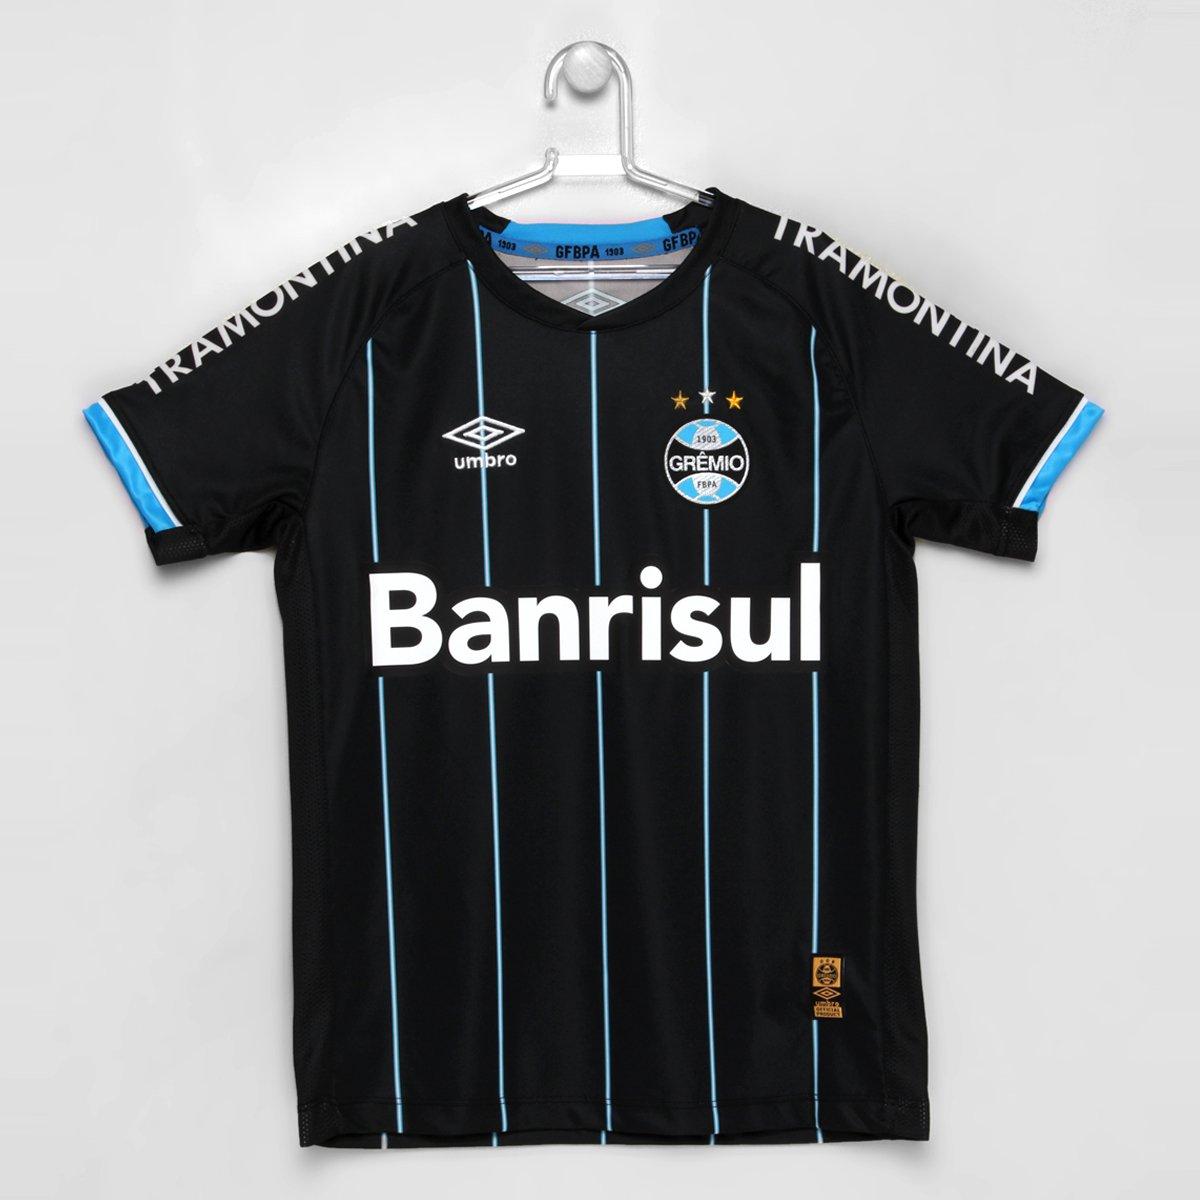 Camisa Grêmio Juvenil IV 2015 Nº 10 Umbro - Compre Agora  68ec4aadbb332